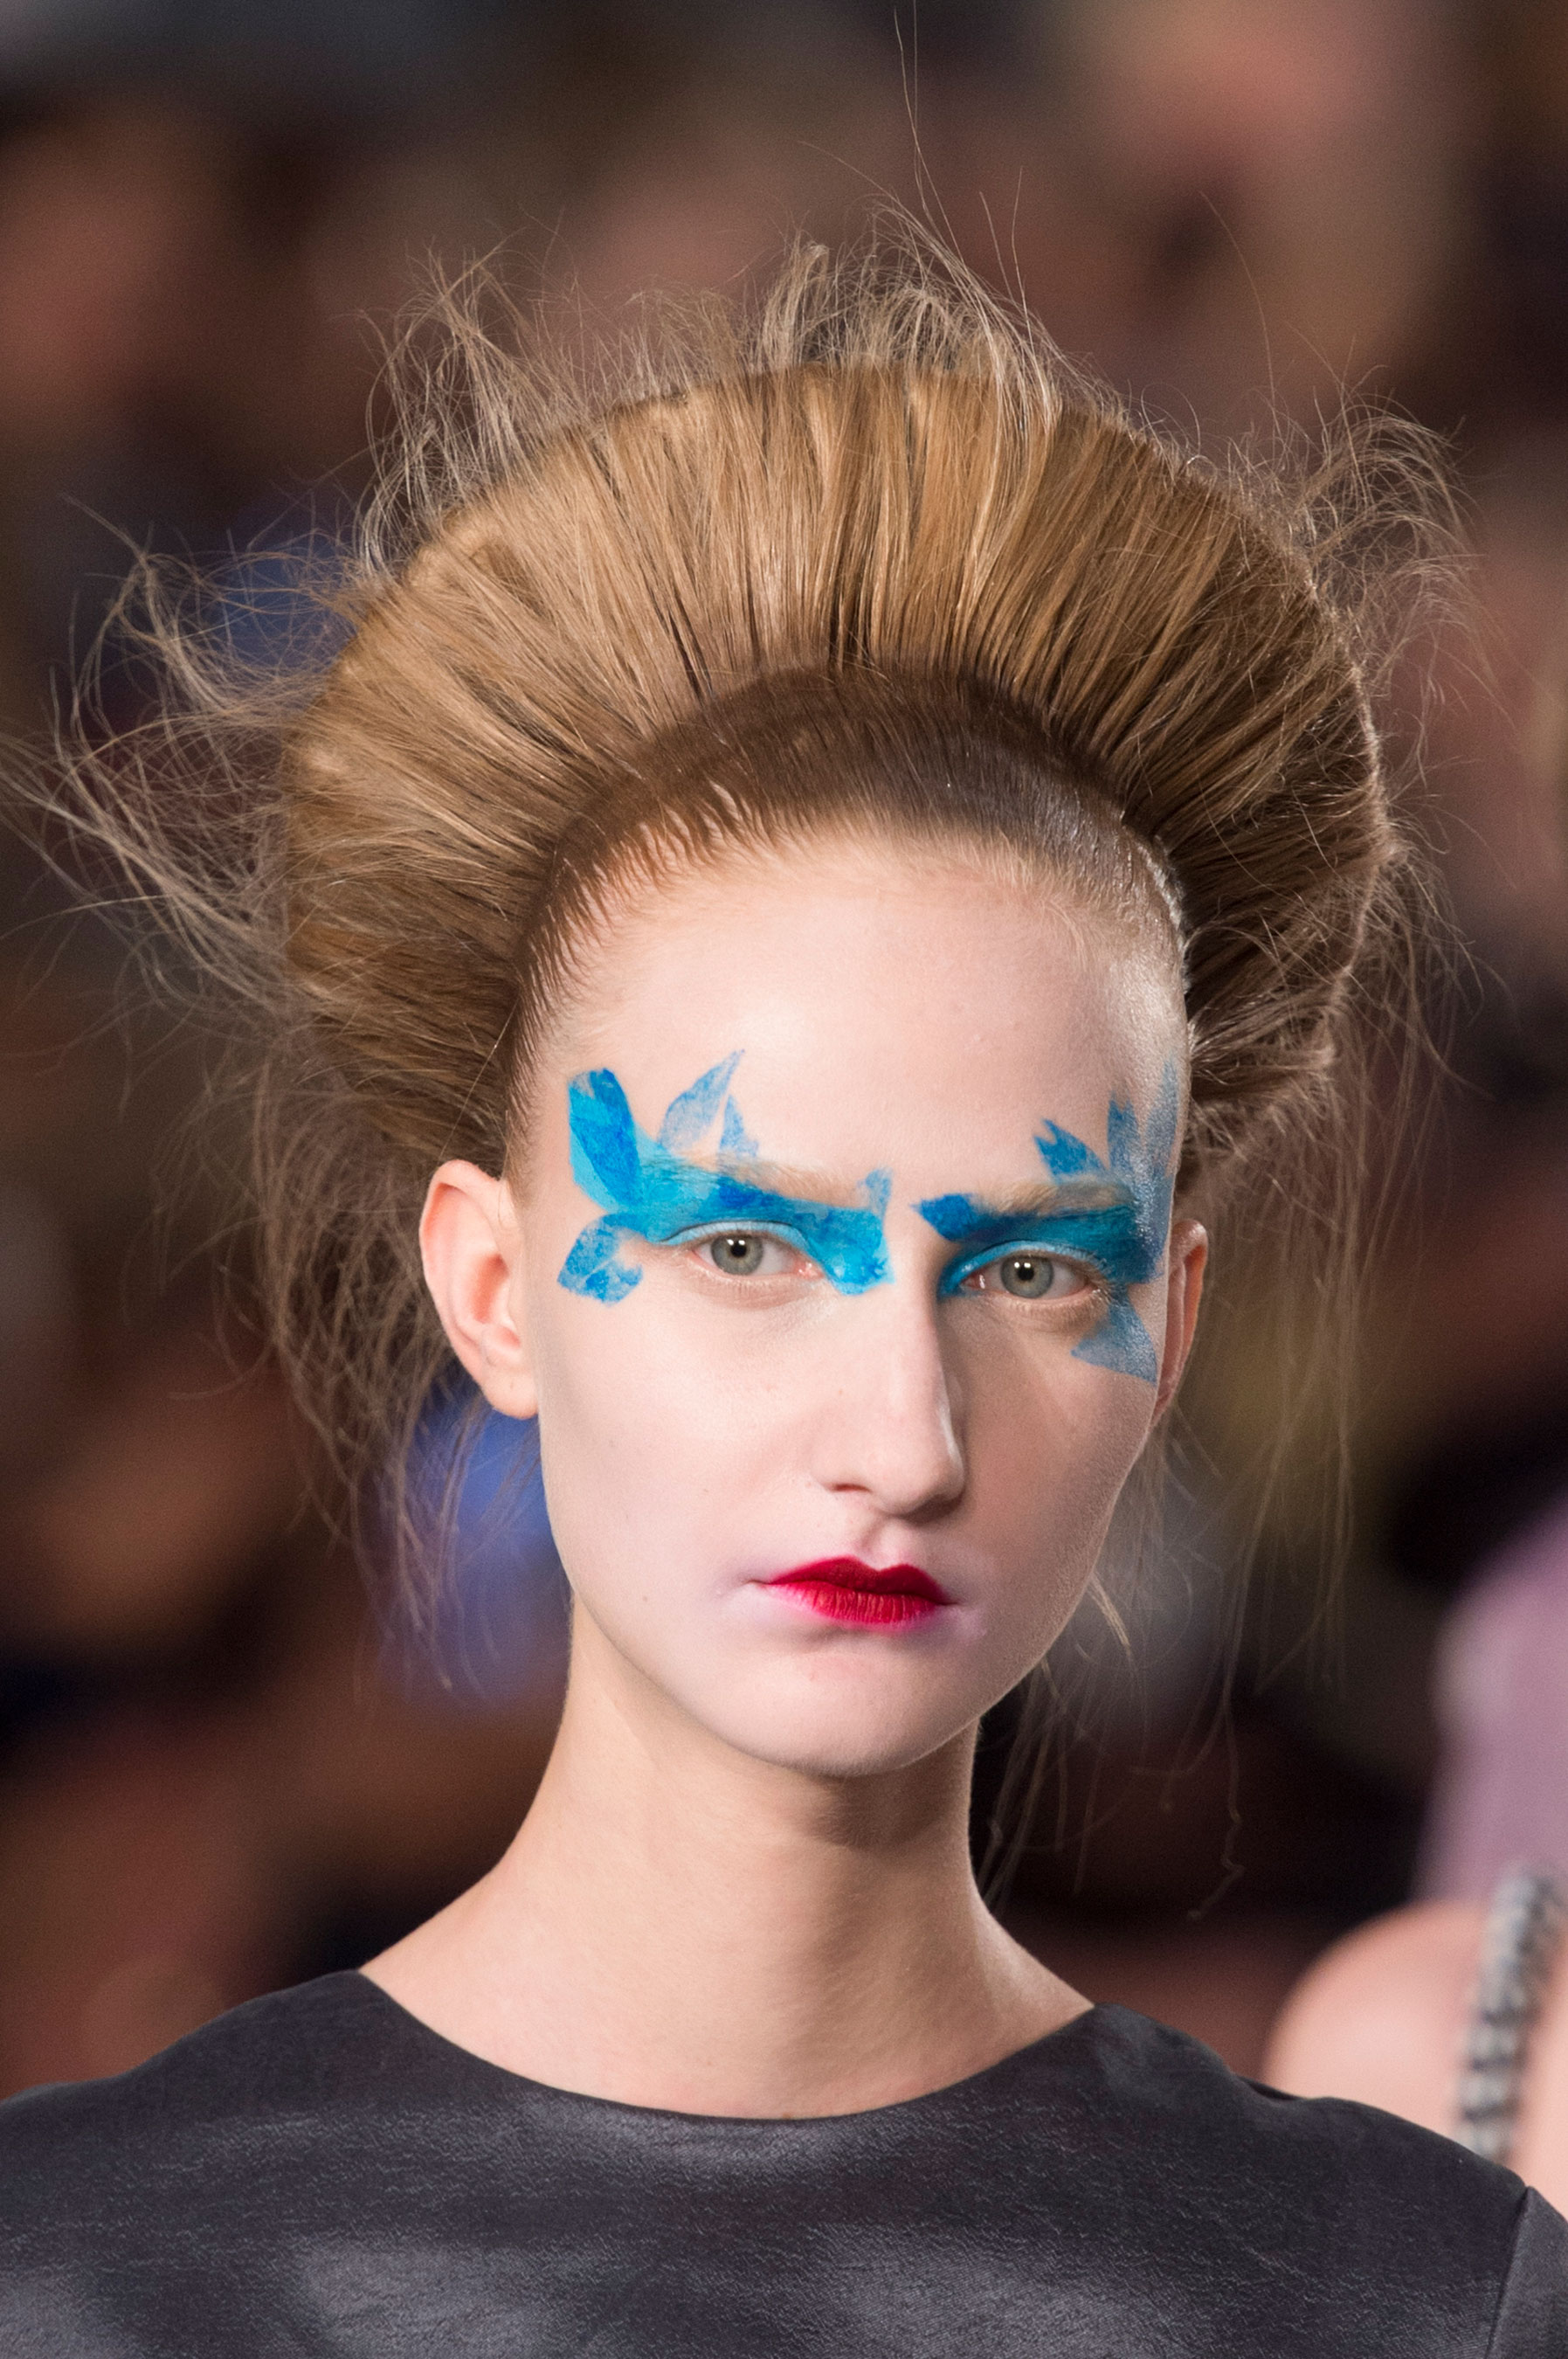 Maison-Margiela-spring-2016-runway-beauty-fashion-show-the-impression-084